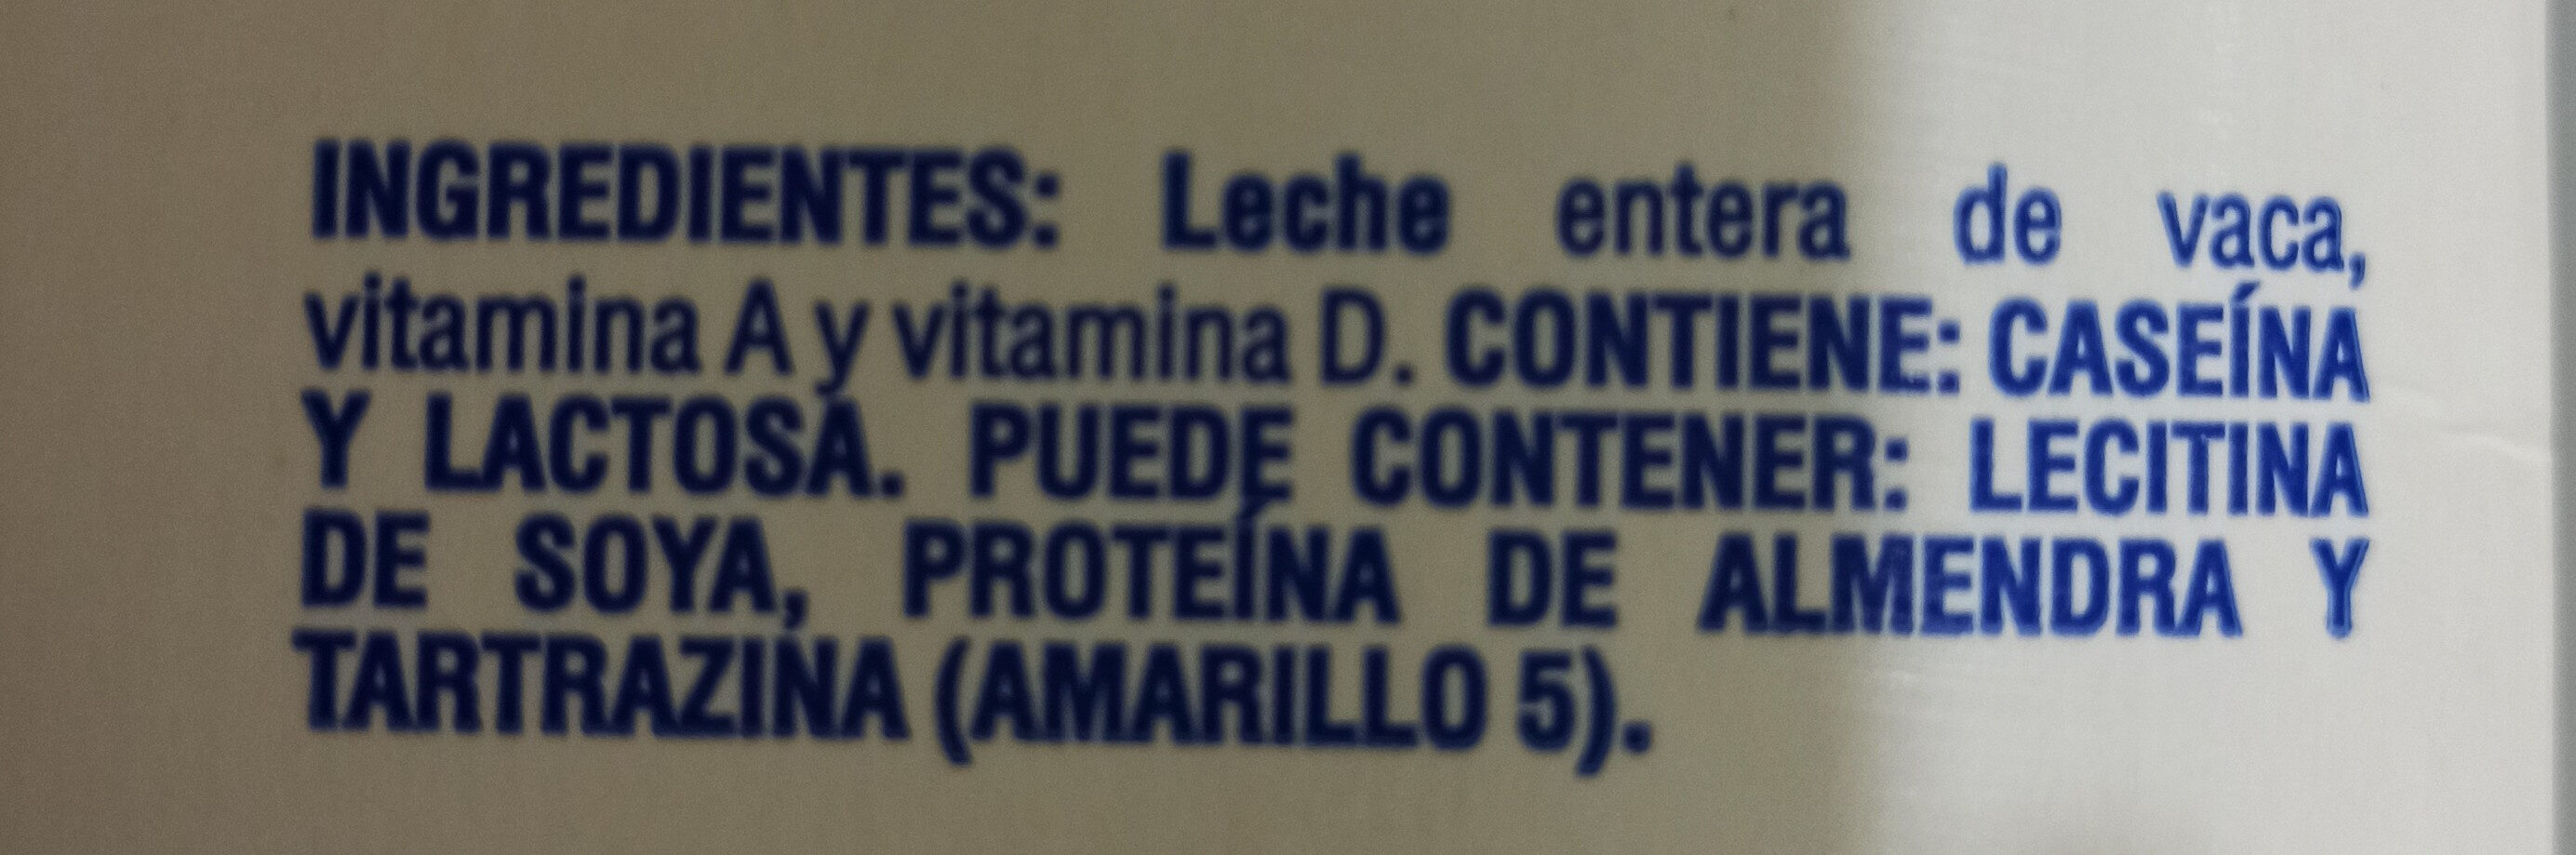 Leche entera - Ingredienti - es